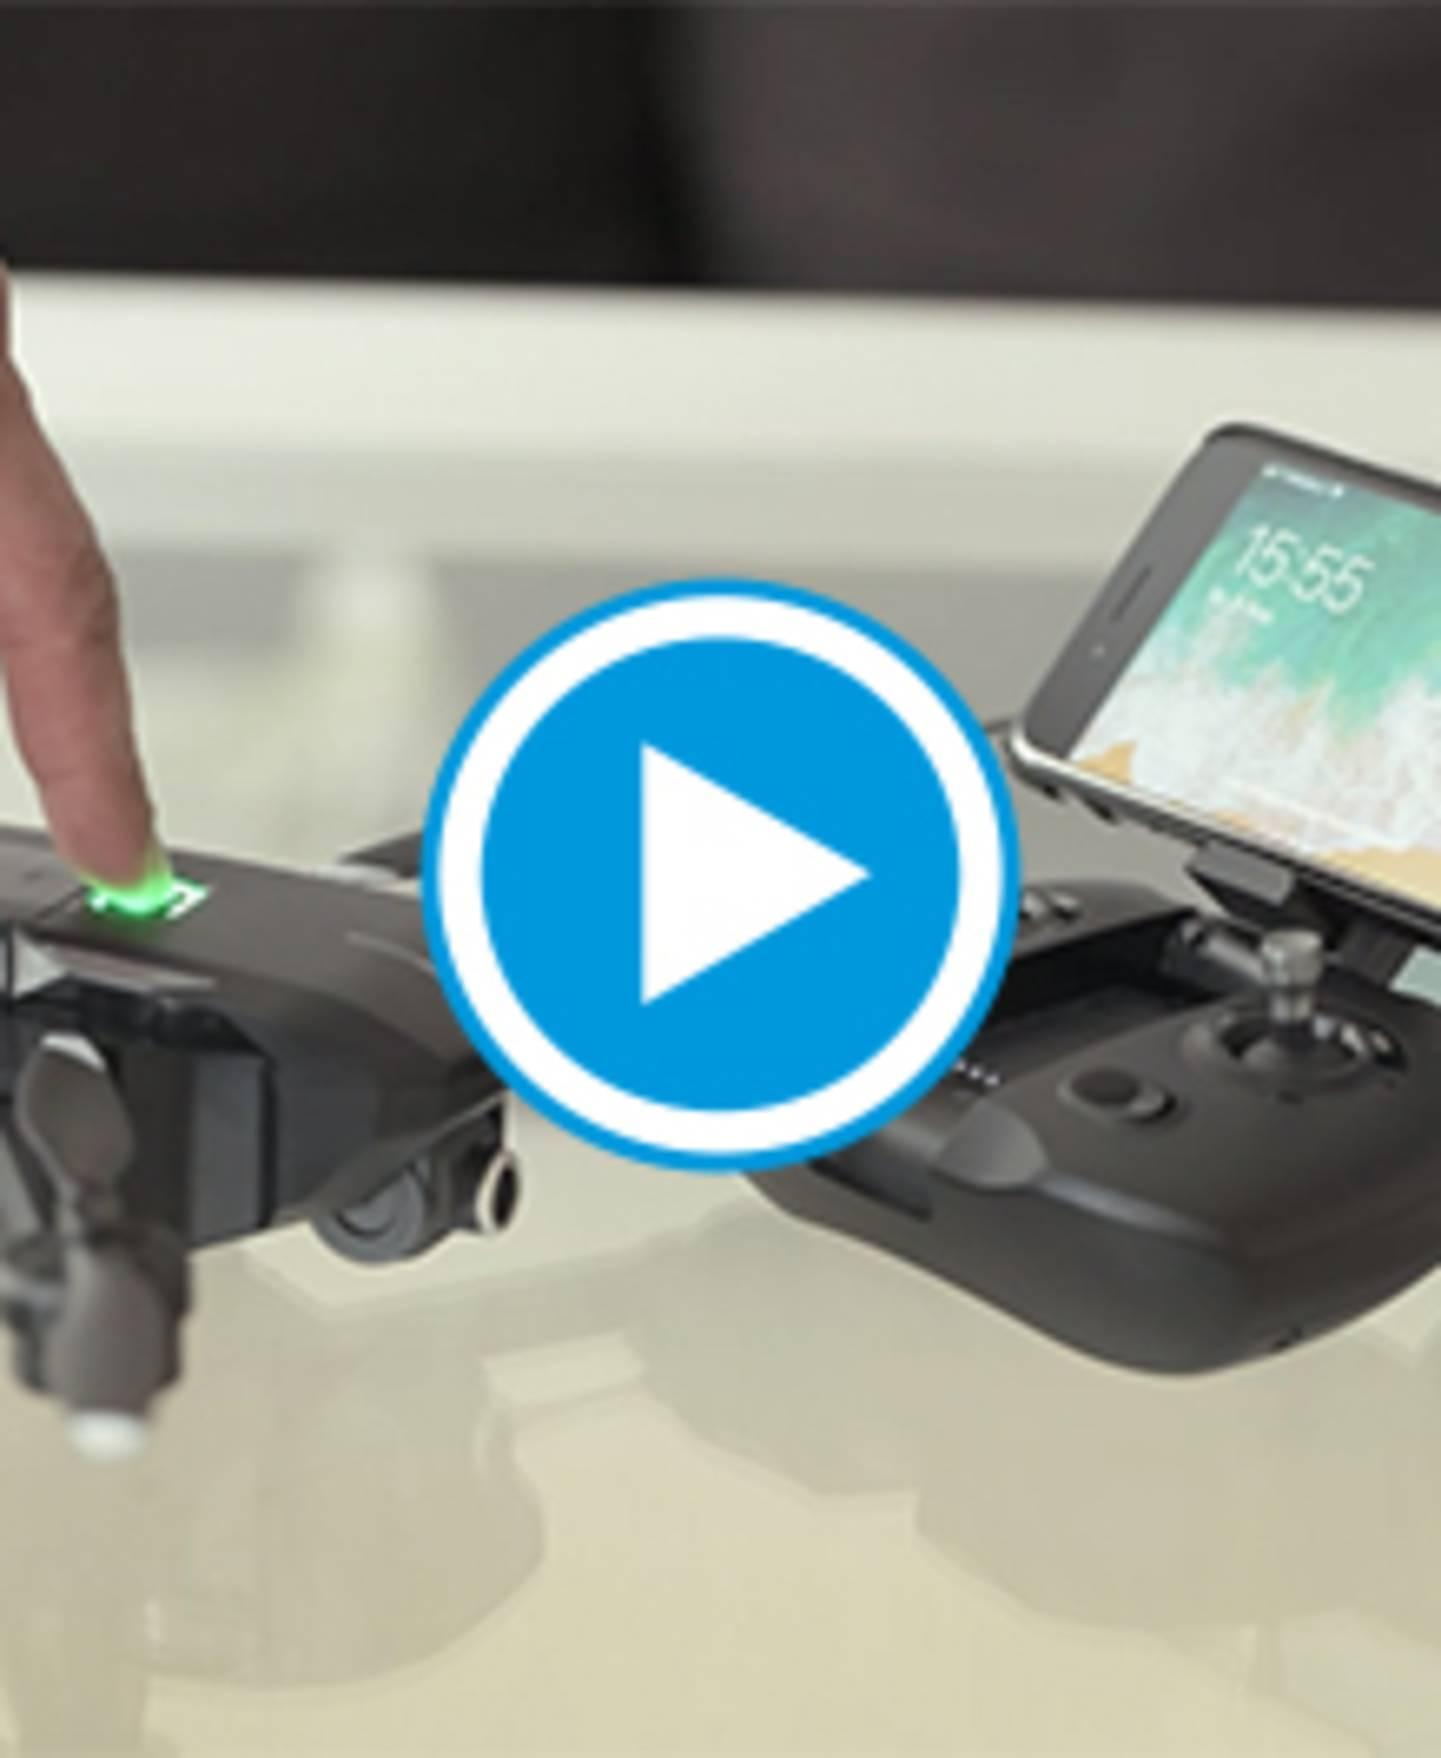 MantisQ - faltbare Kameradrohne - Video